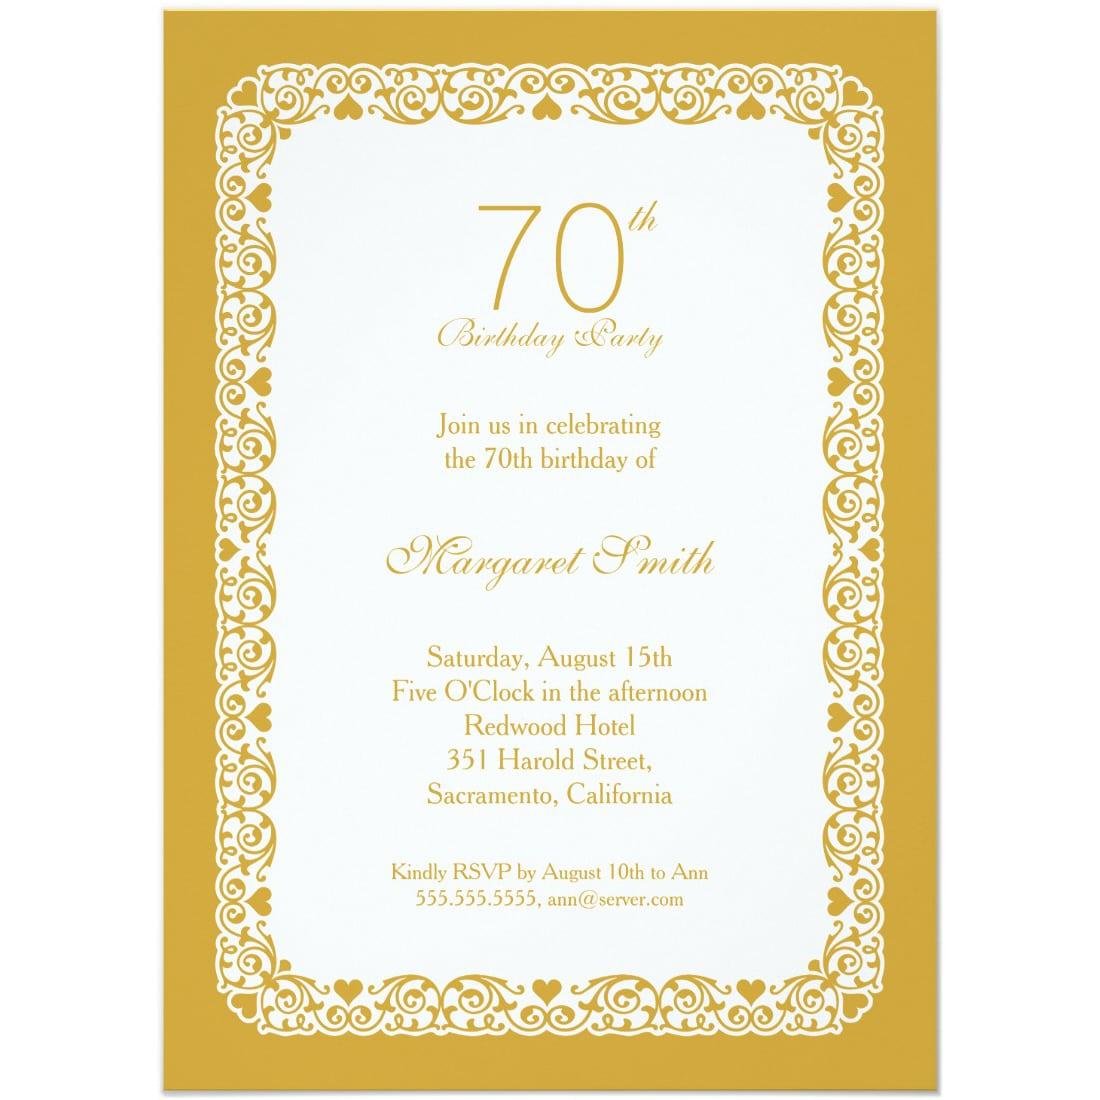 Elegant Personalized 70th Birthday Party Invitations